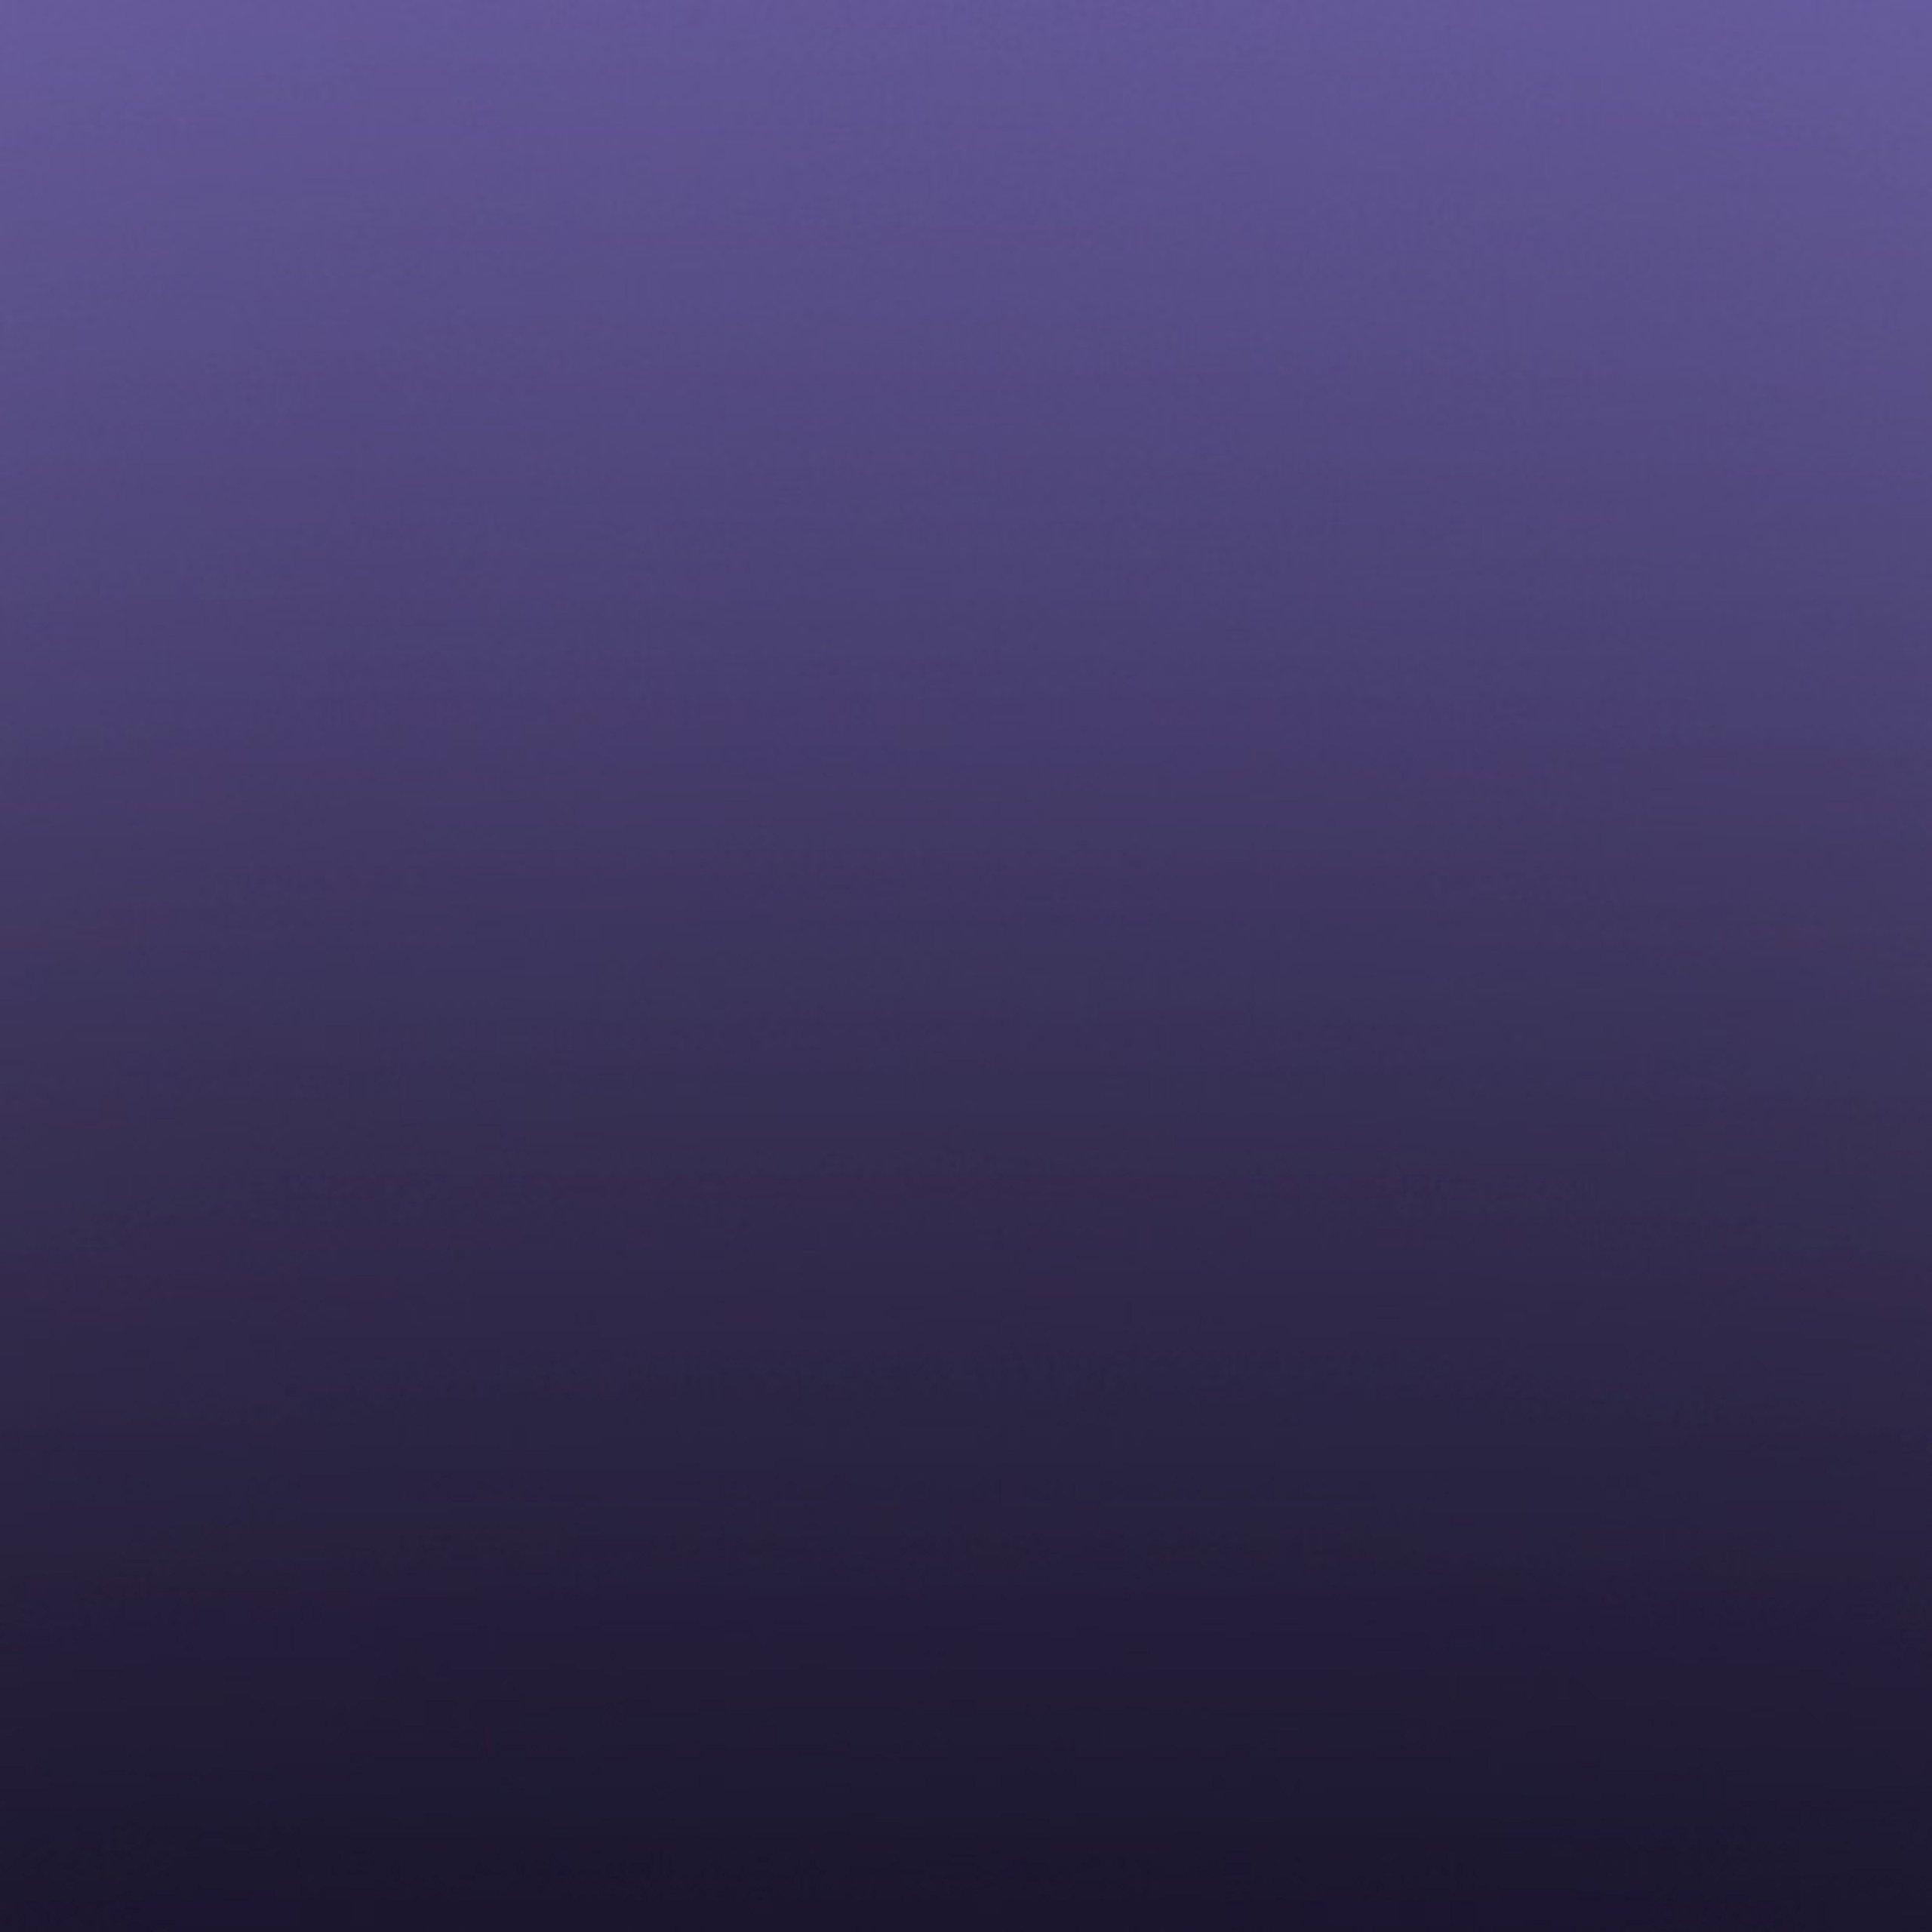 Rachael Ray Hard Enamel Nonstick 3/4-Quart Butter Warmer, Purple by Rachael Ray (Image #3)